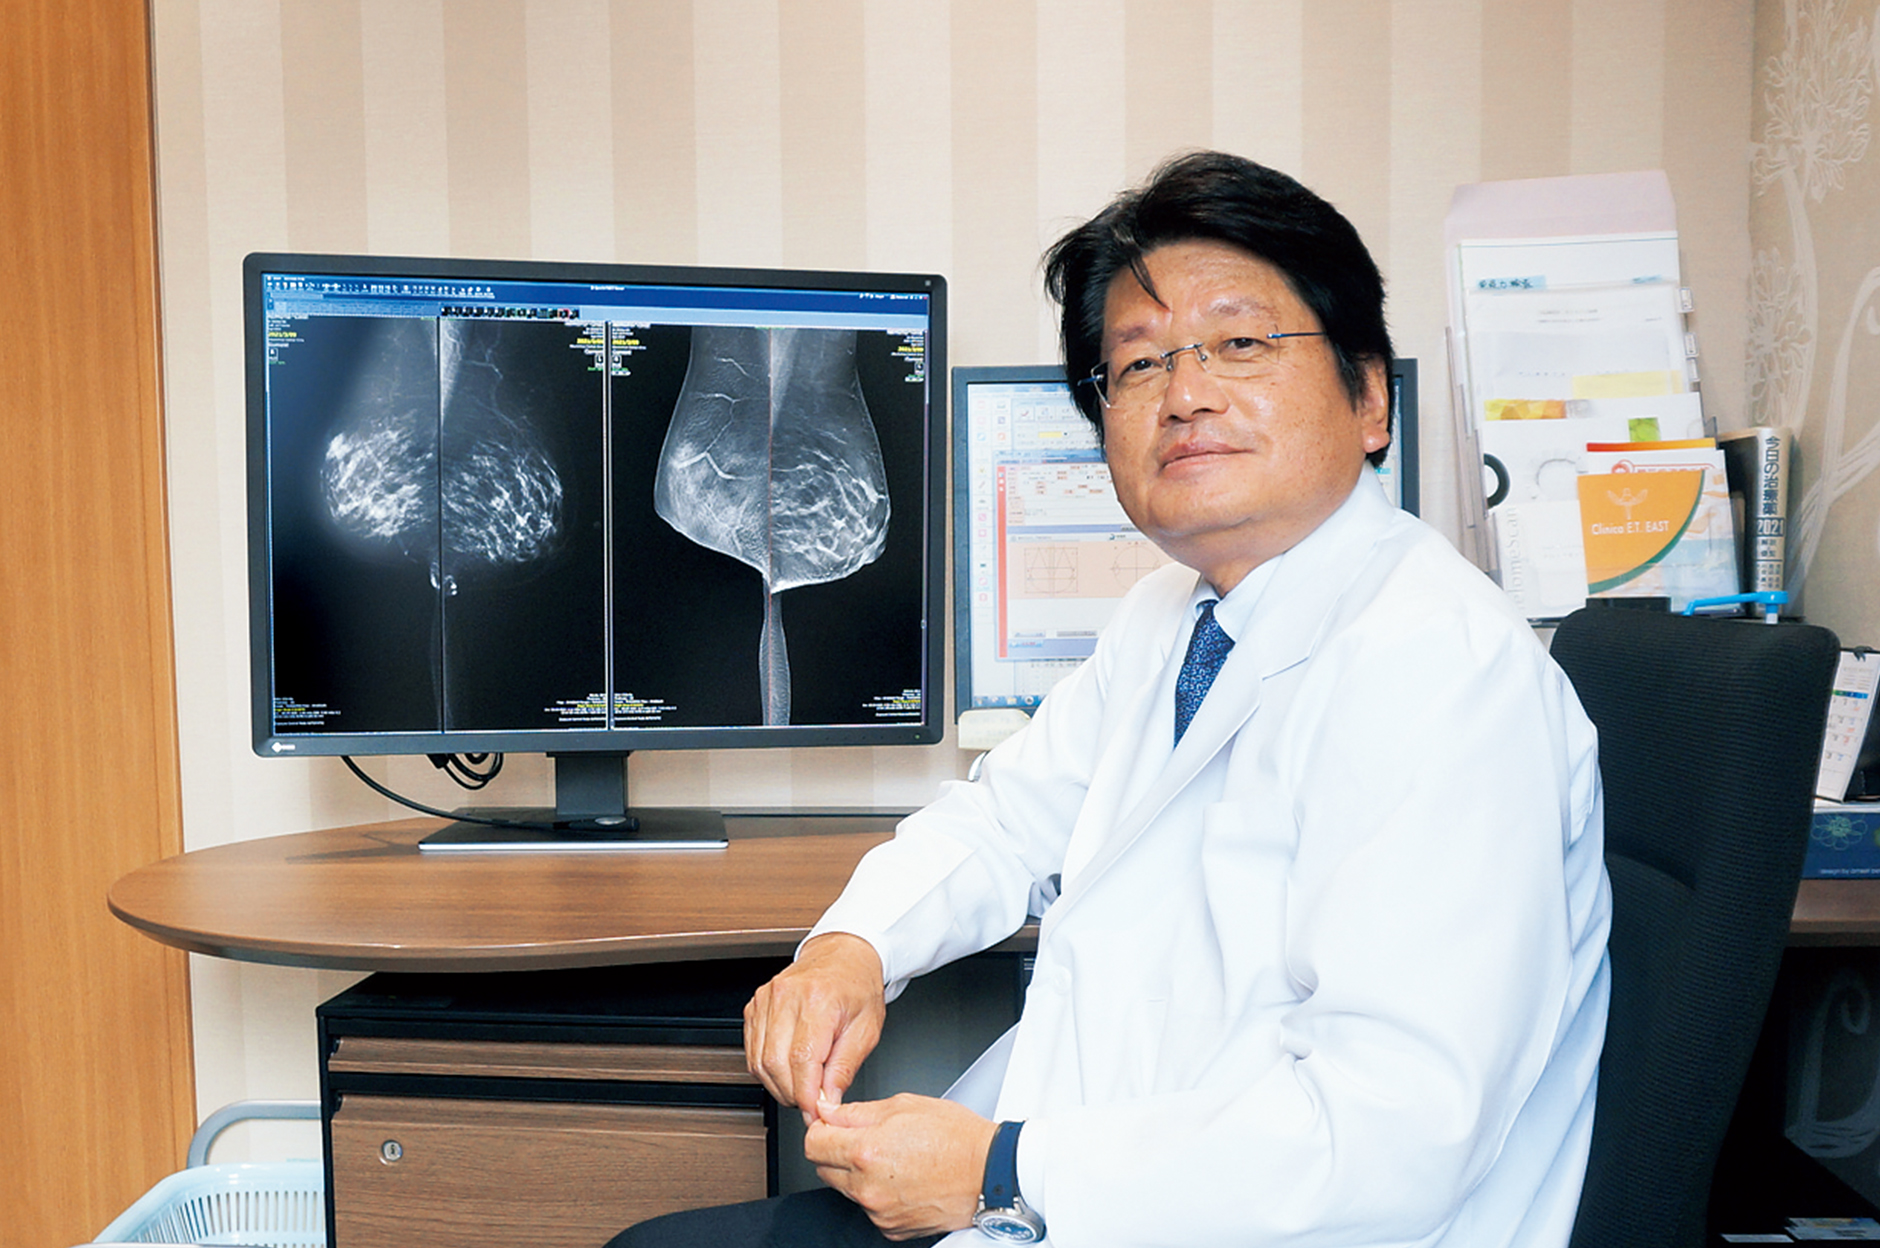 Dr. Toshihiko Sato